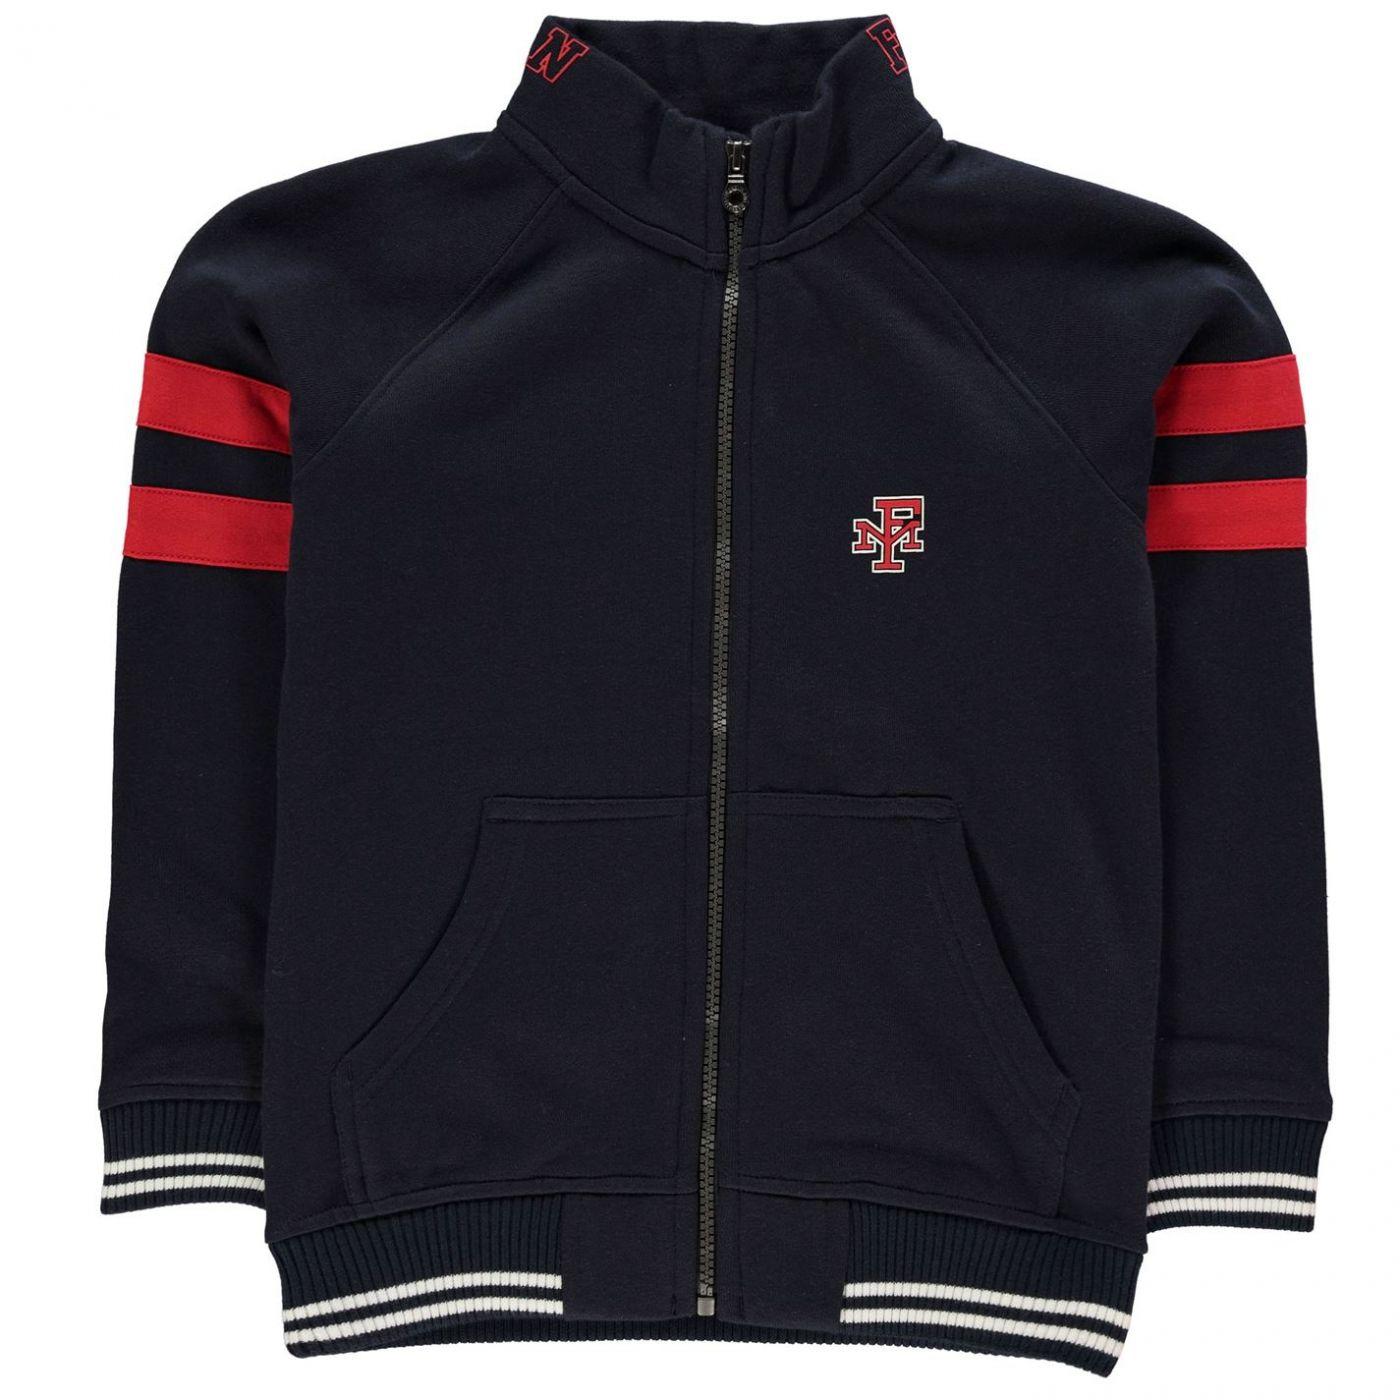 Franklin and Marshall Fun Zip Sweatshirt